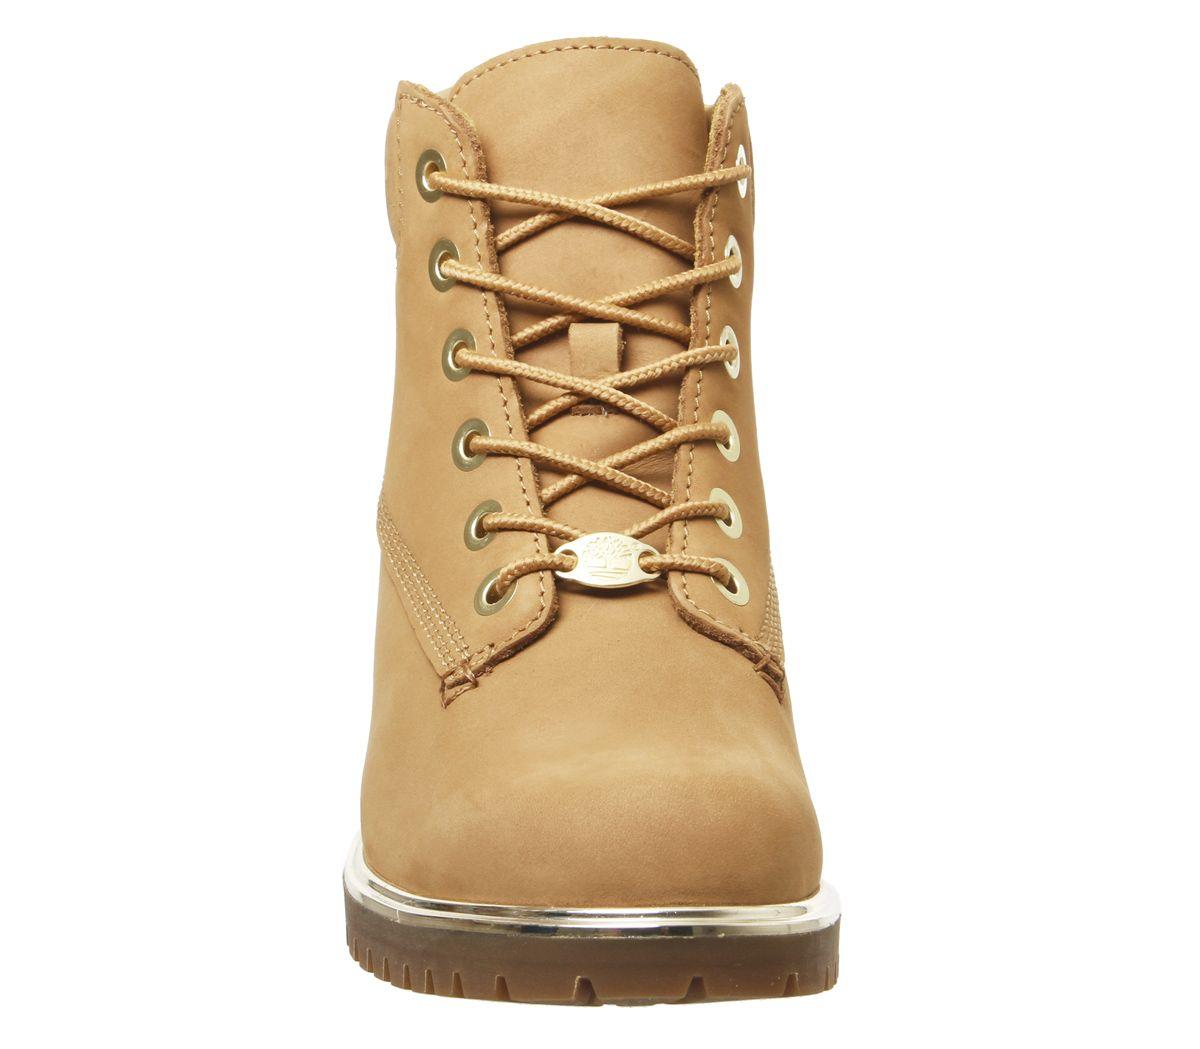 Details zu Womens Timberland Slim Premium 6 Inch Boots Wheat Gold Rand Boots